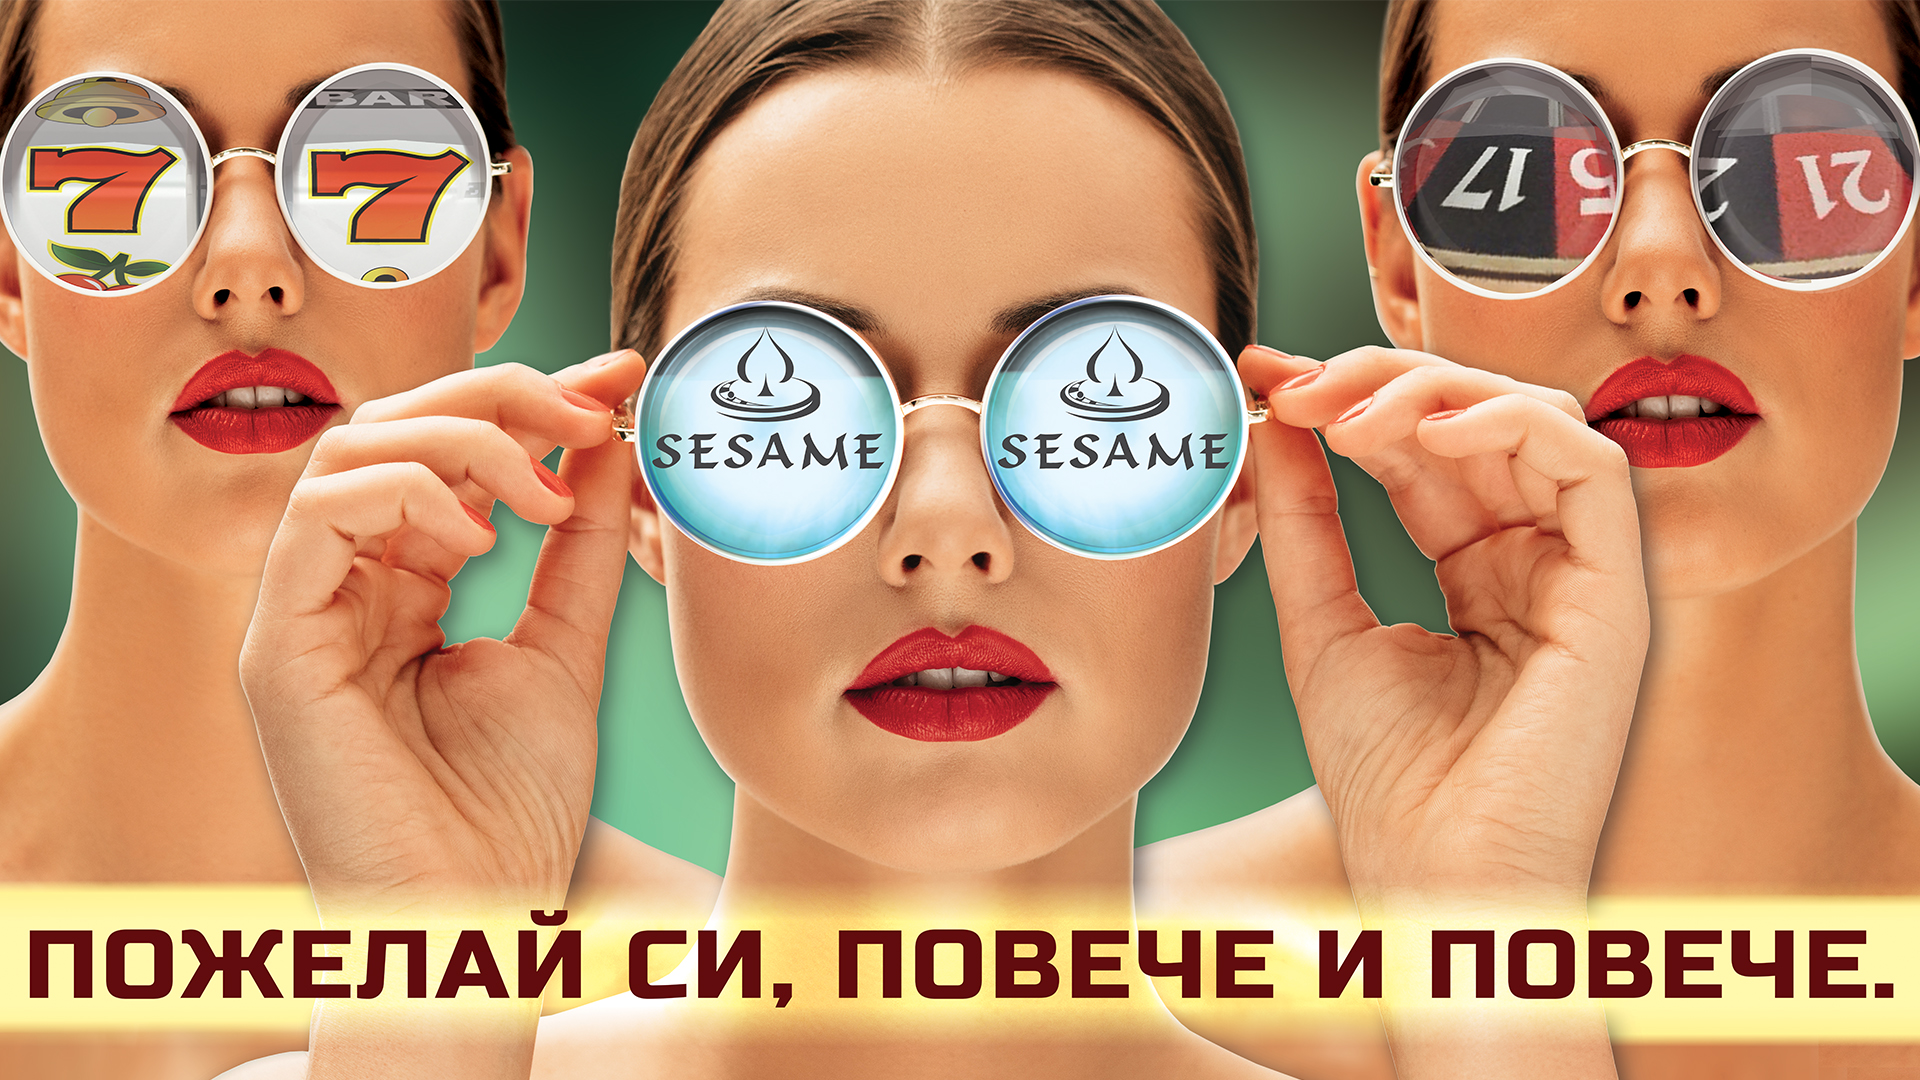 sesame-slot-games-roulette-казино-сезам-софия-слот-игири